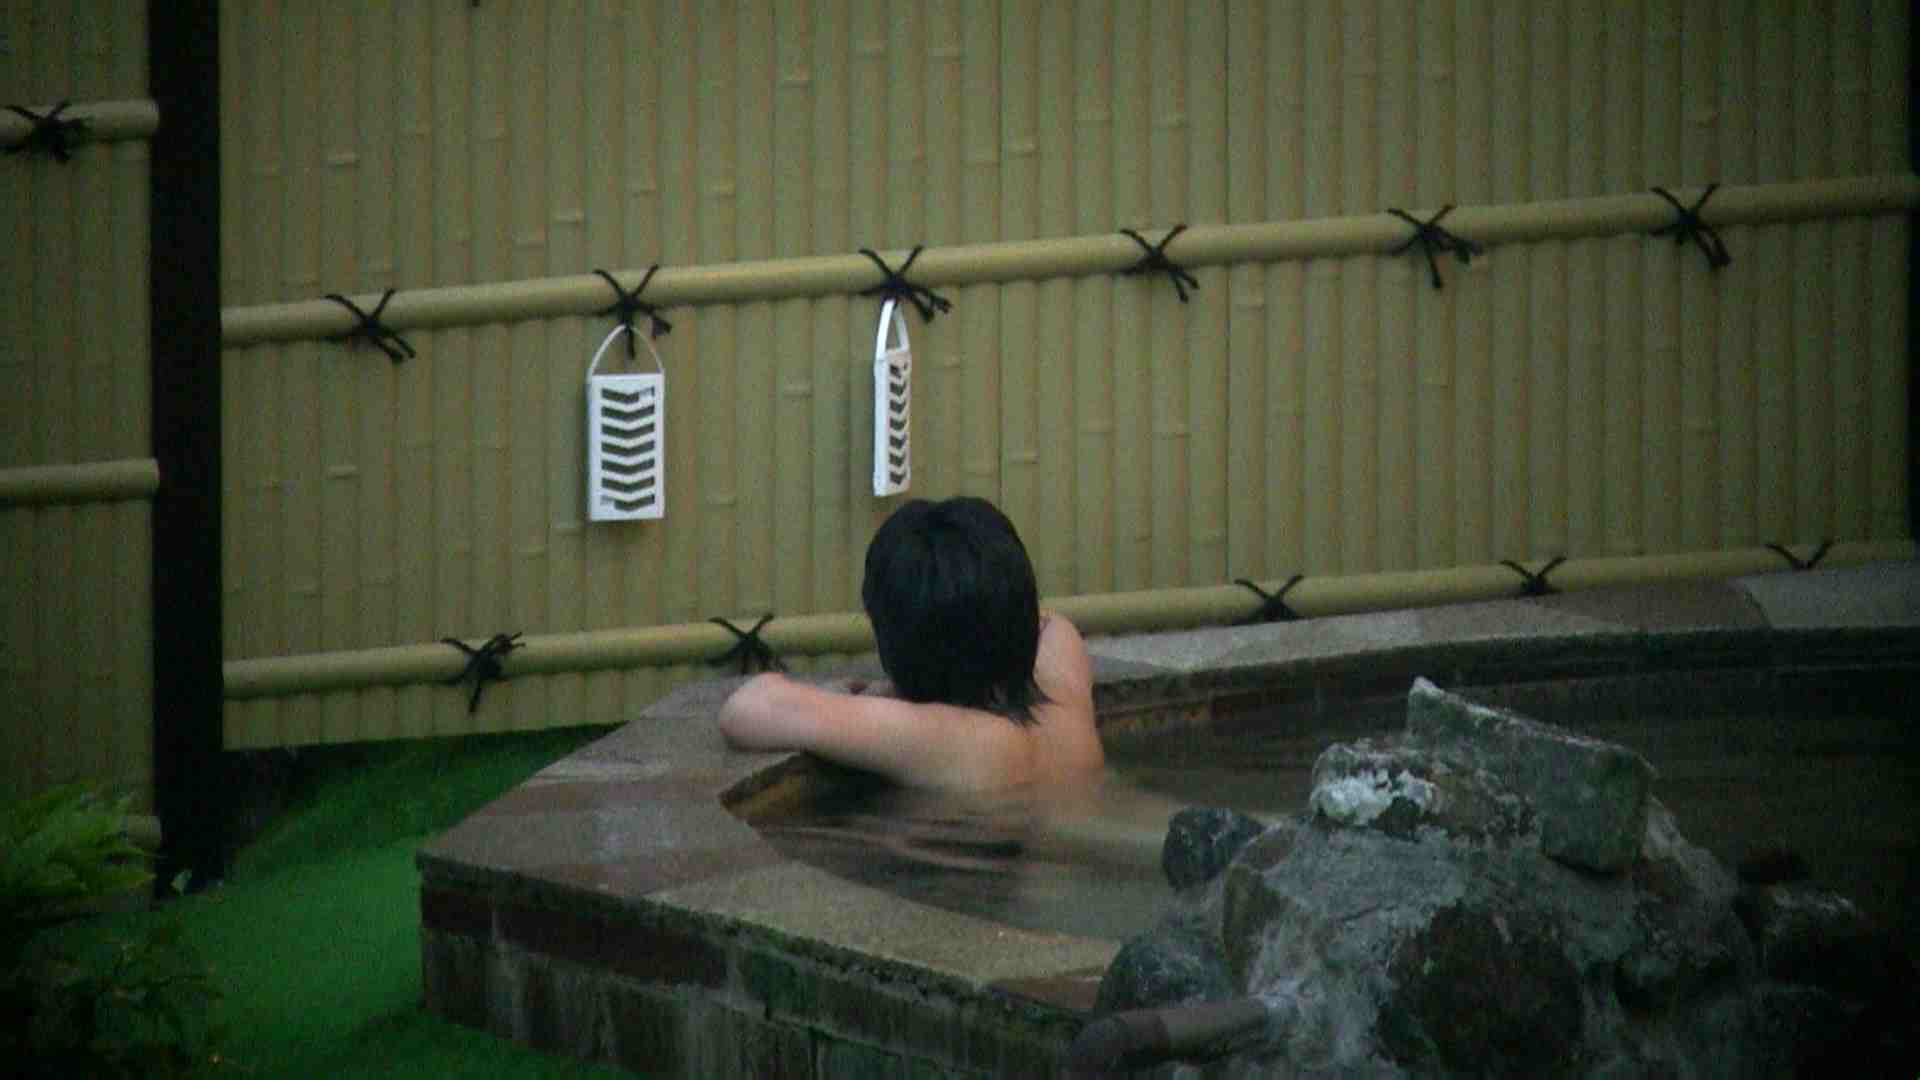 Aquaな露天風呂Vol.05【VIP】 盗撮大放出 エロ画像 65連発 23